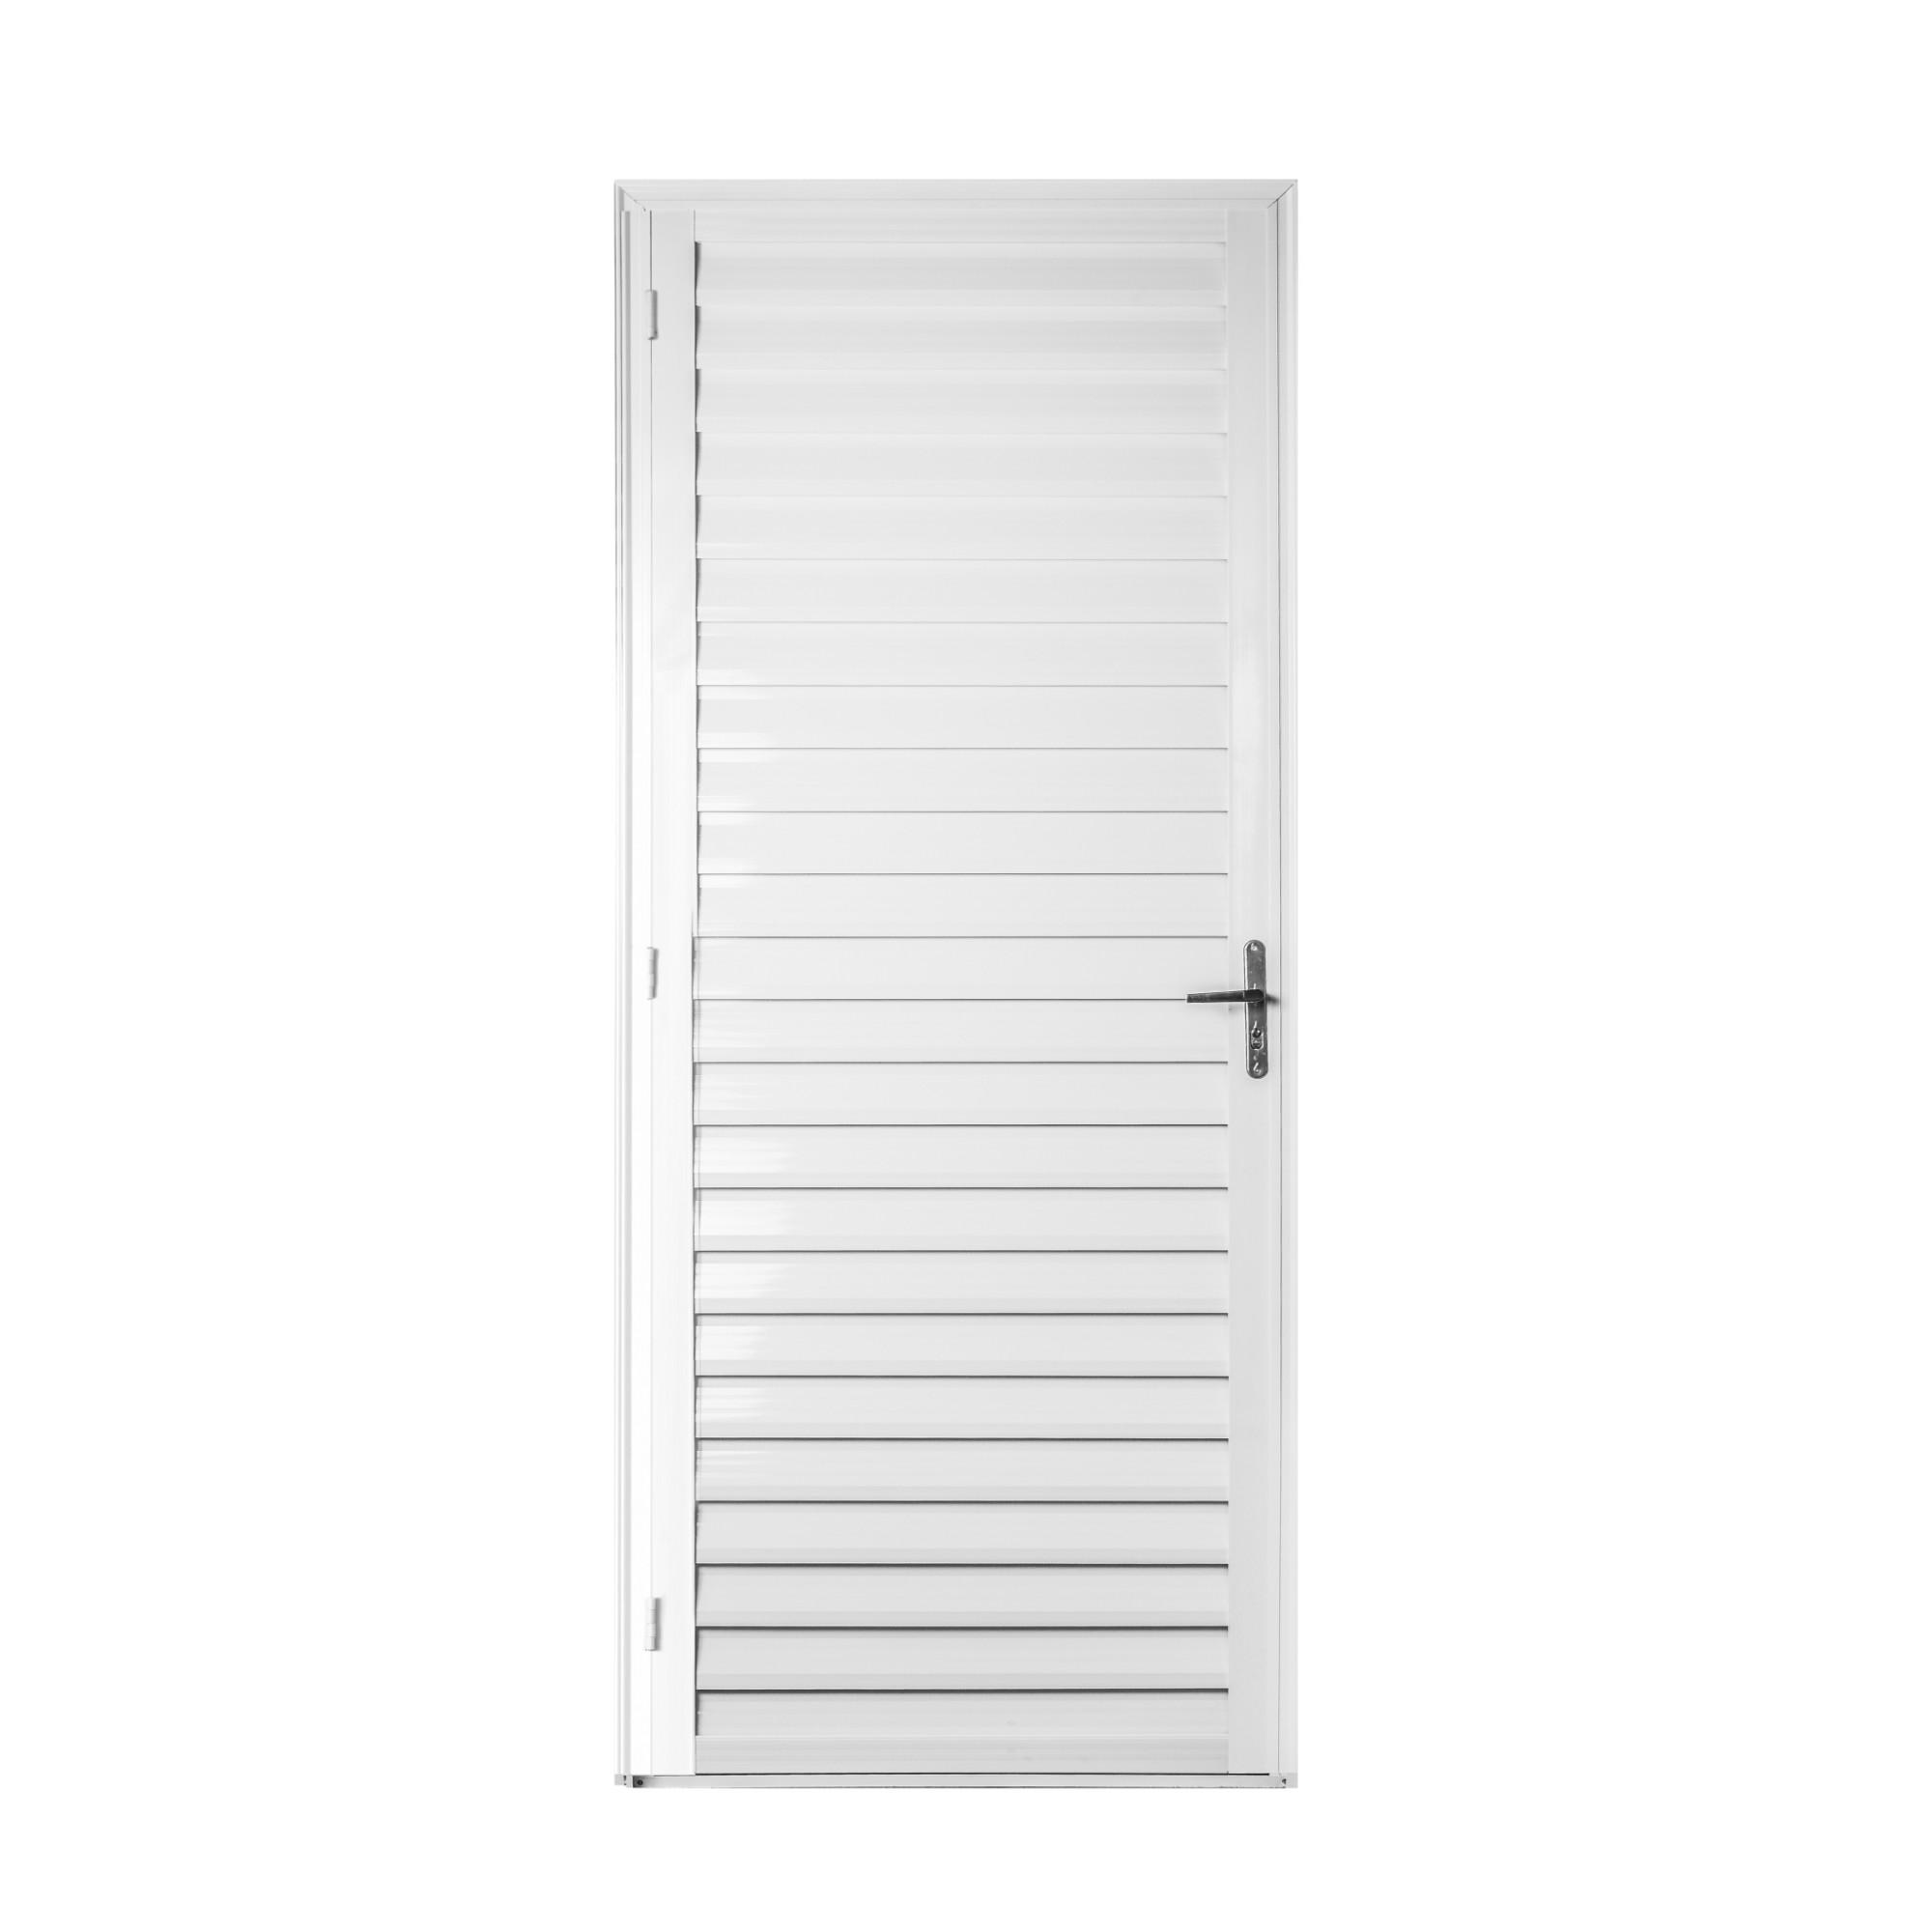 Porta de Abrir de Aluminio Veneziana 210x90 cm Branca Lado Direito - 911553 - Aluvid